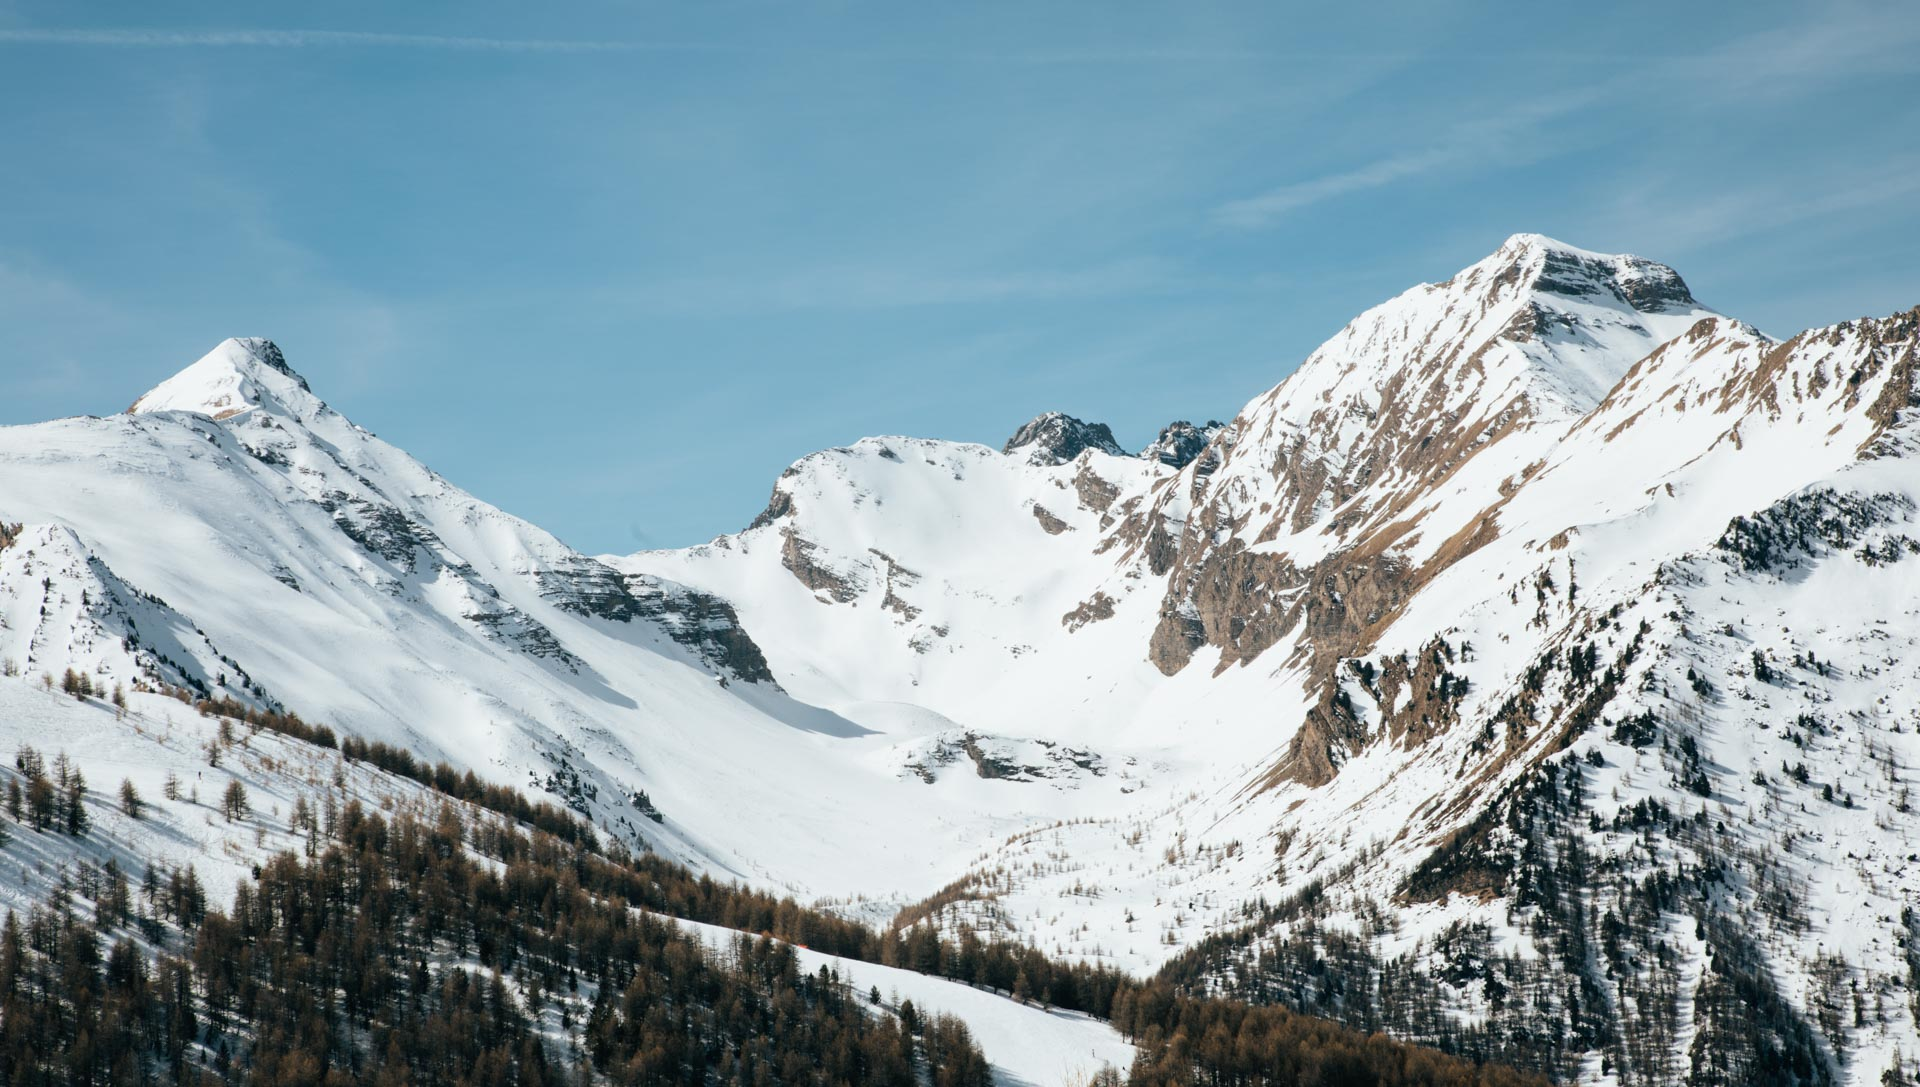 The snow cover mountainous peaks above Les Orres ski resort